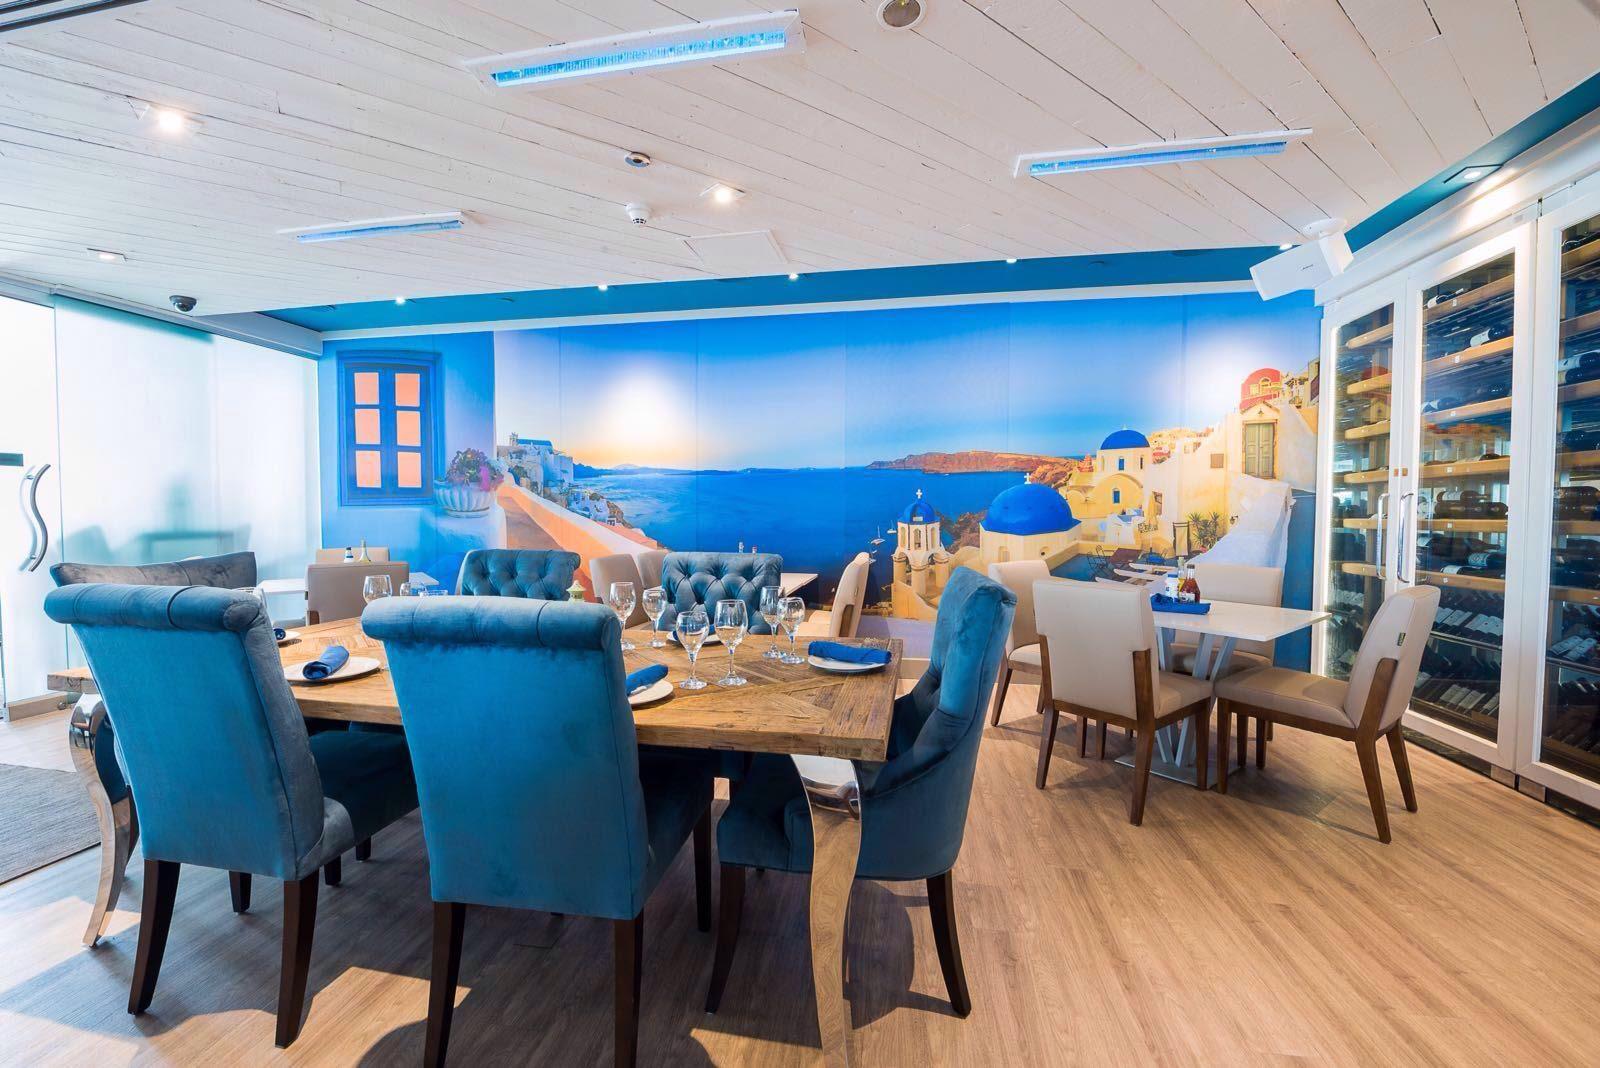 Santorini Restaurant Merrick Menu